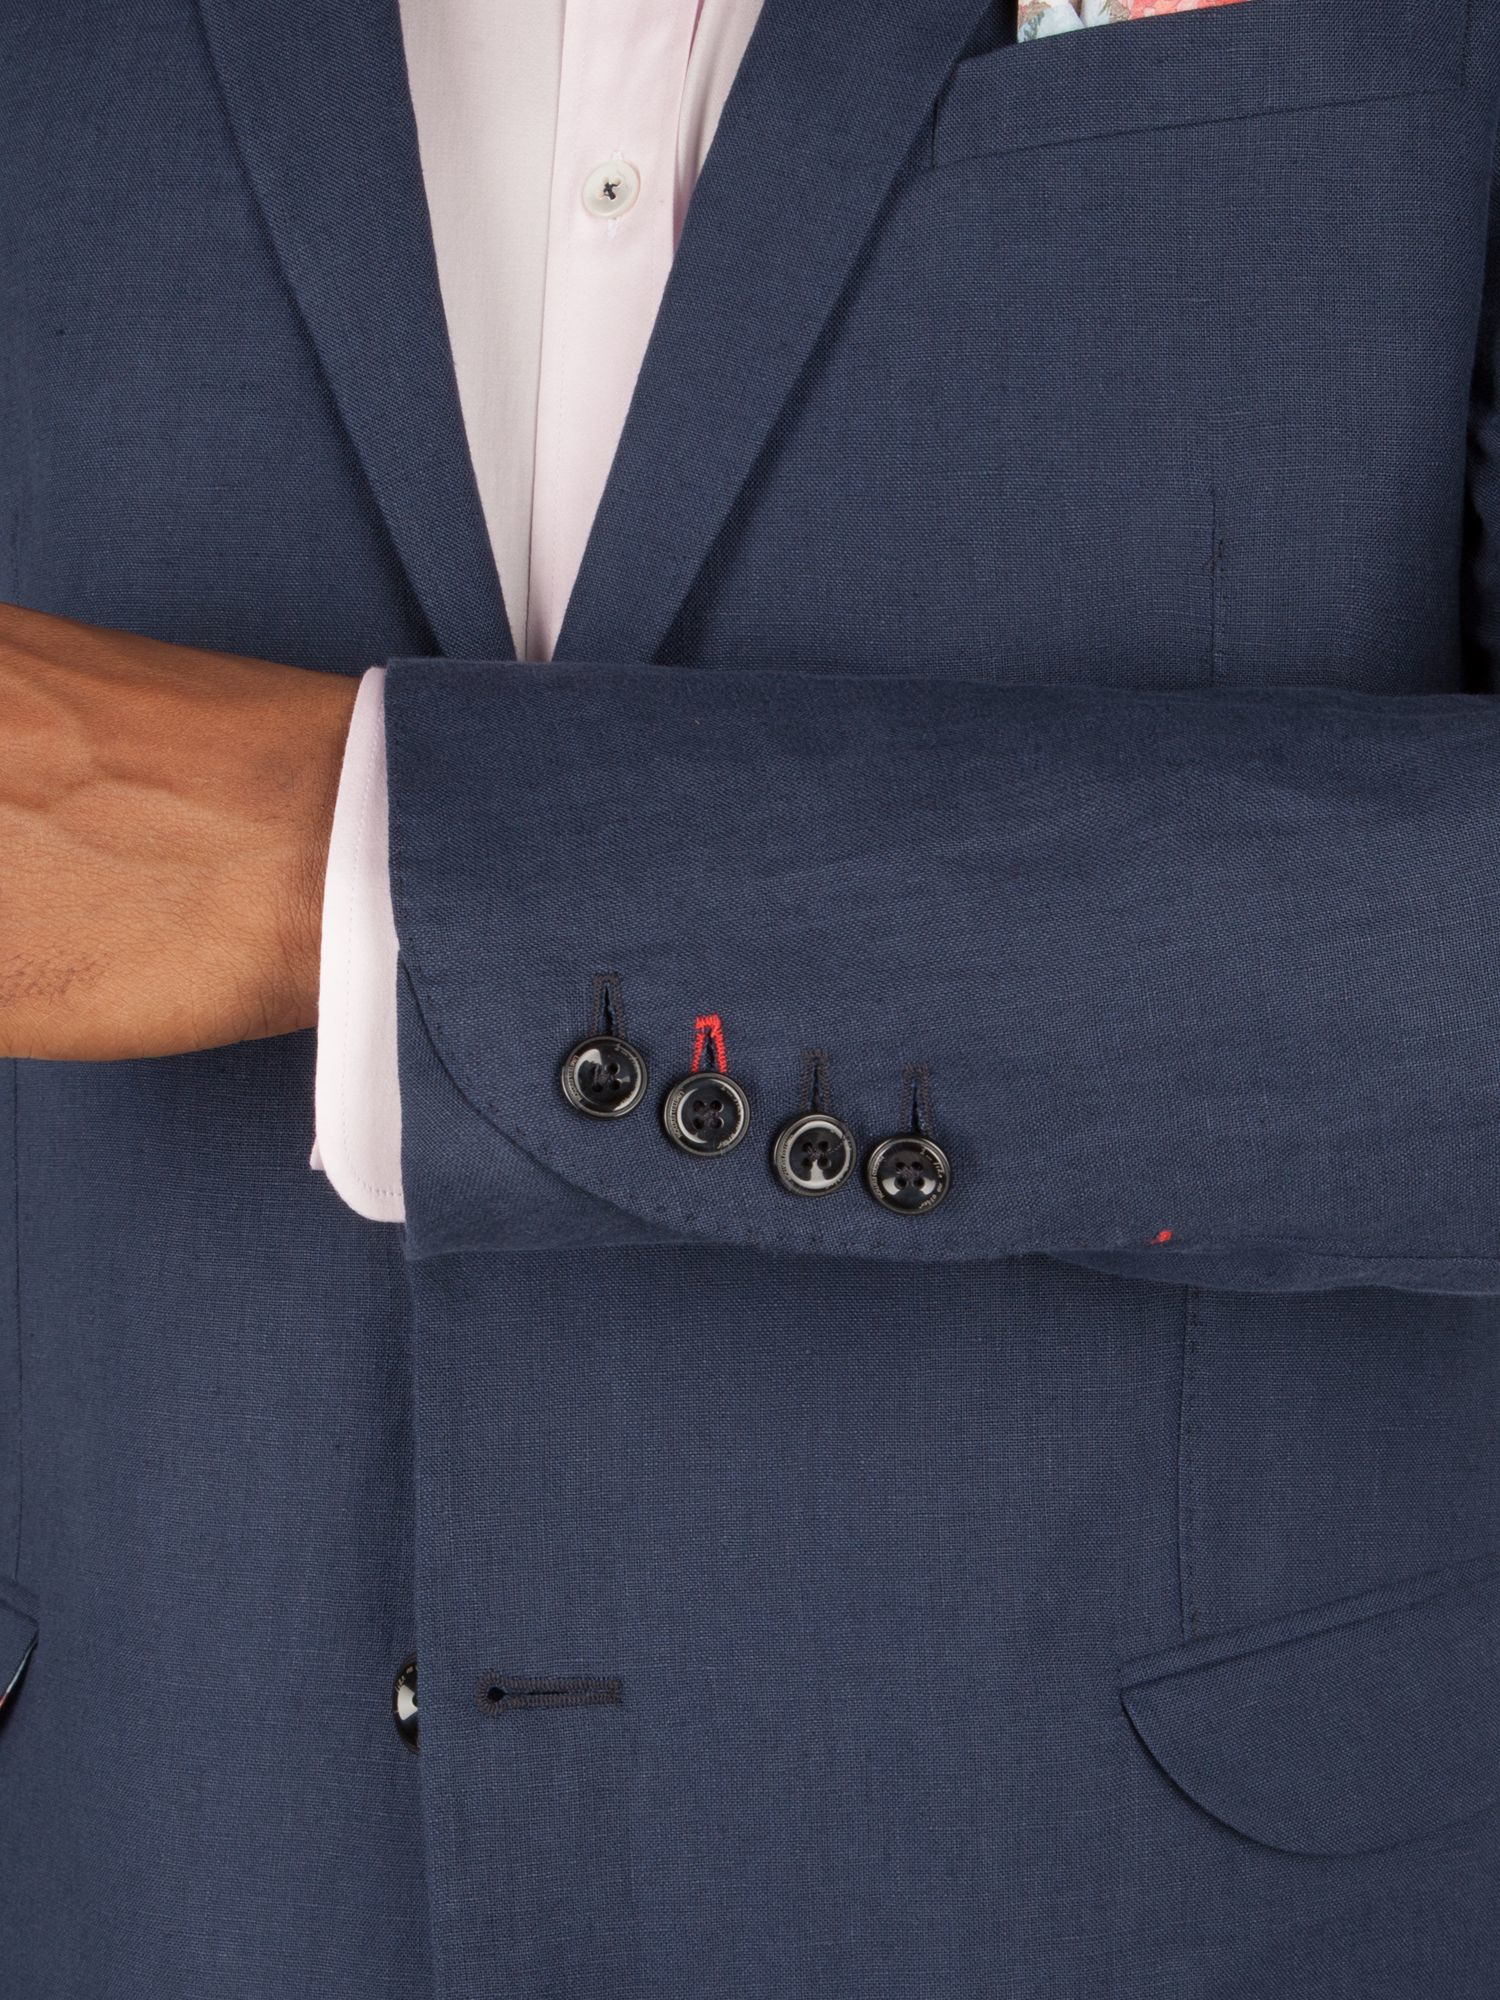 1 Like No Other Linen Princeton Jacket in Blue for Men